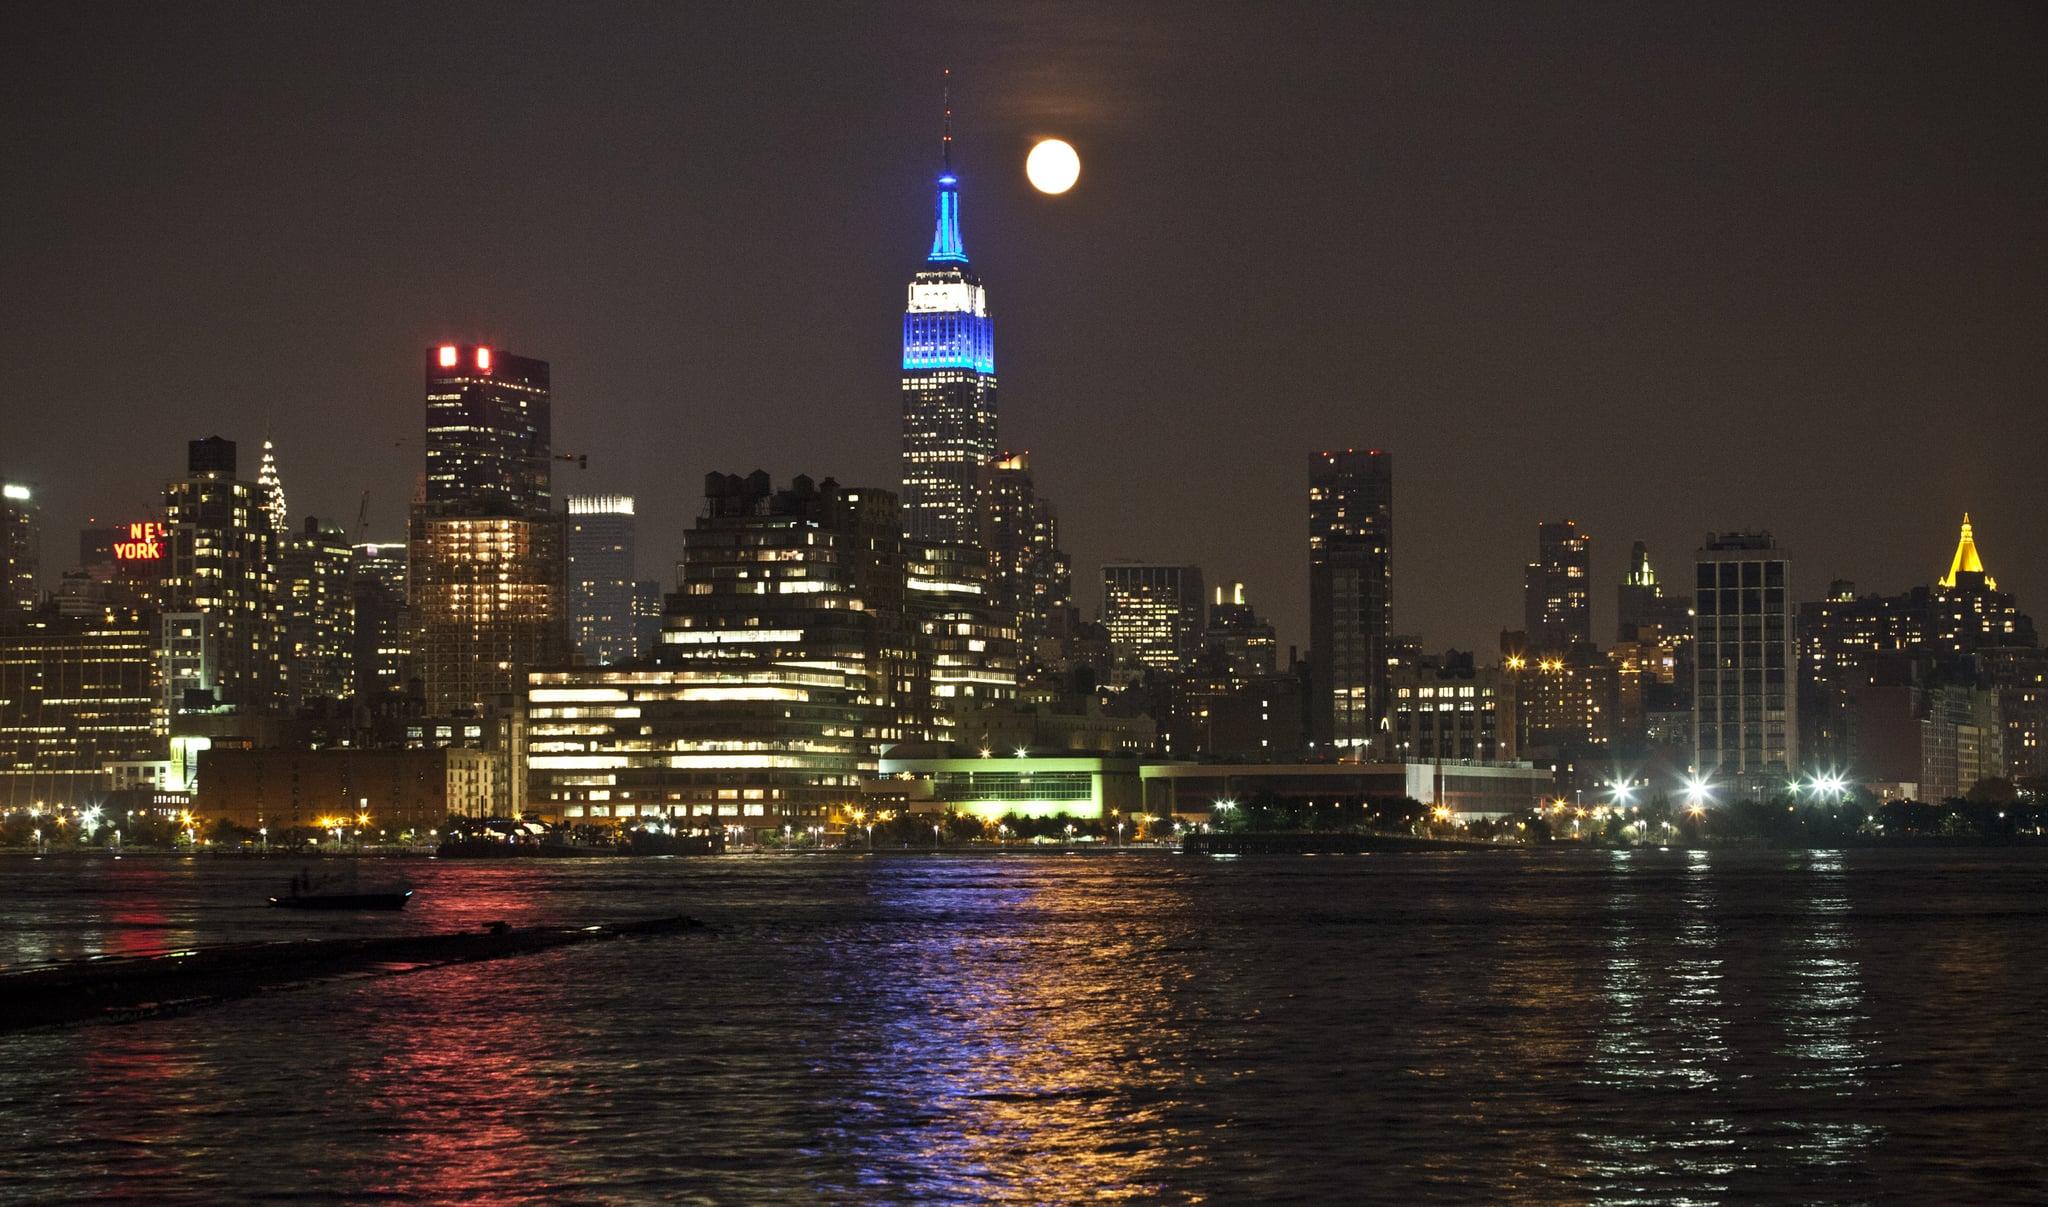 Good Night, Moon